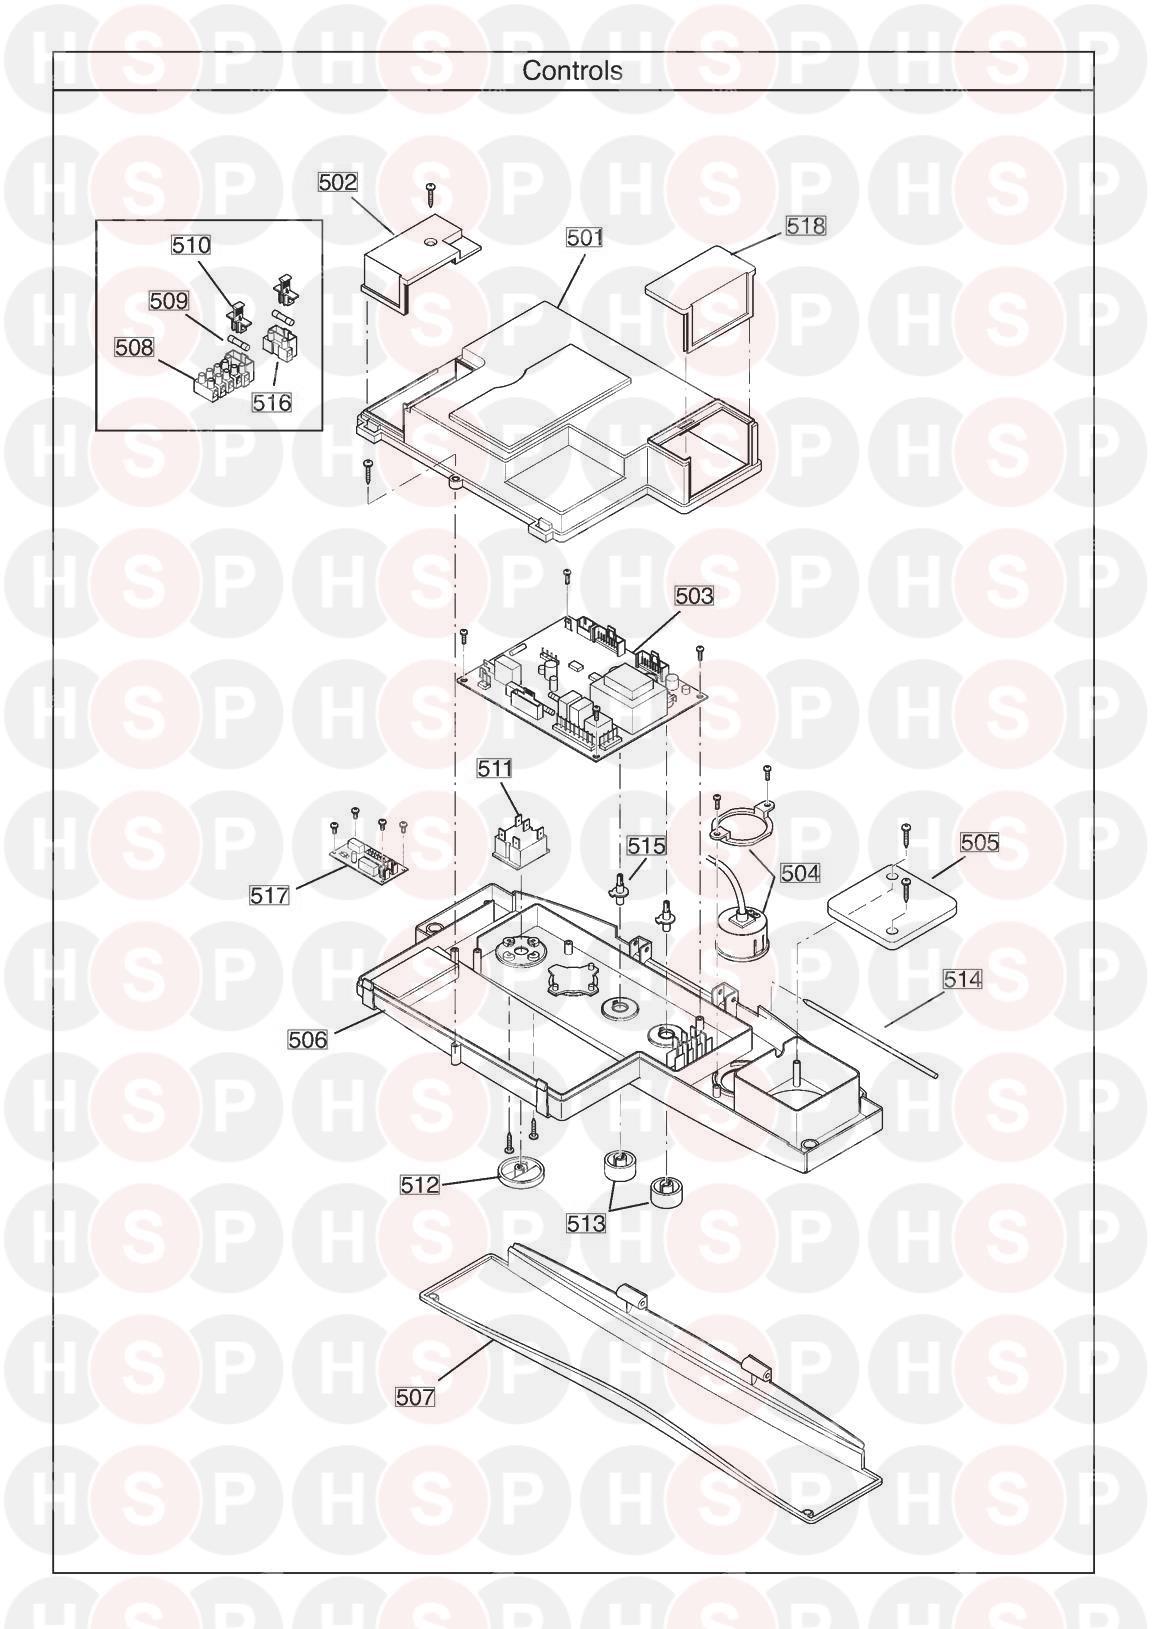 potterton promax system 32 erp appliance diagram  controls